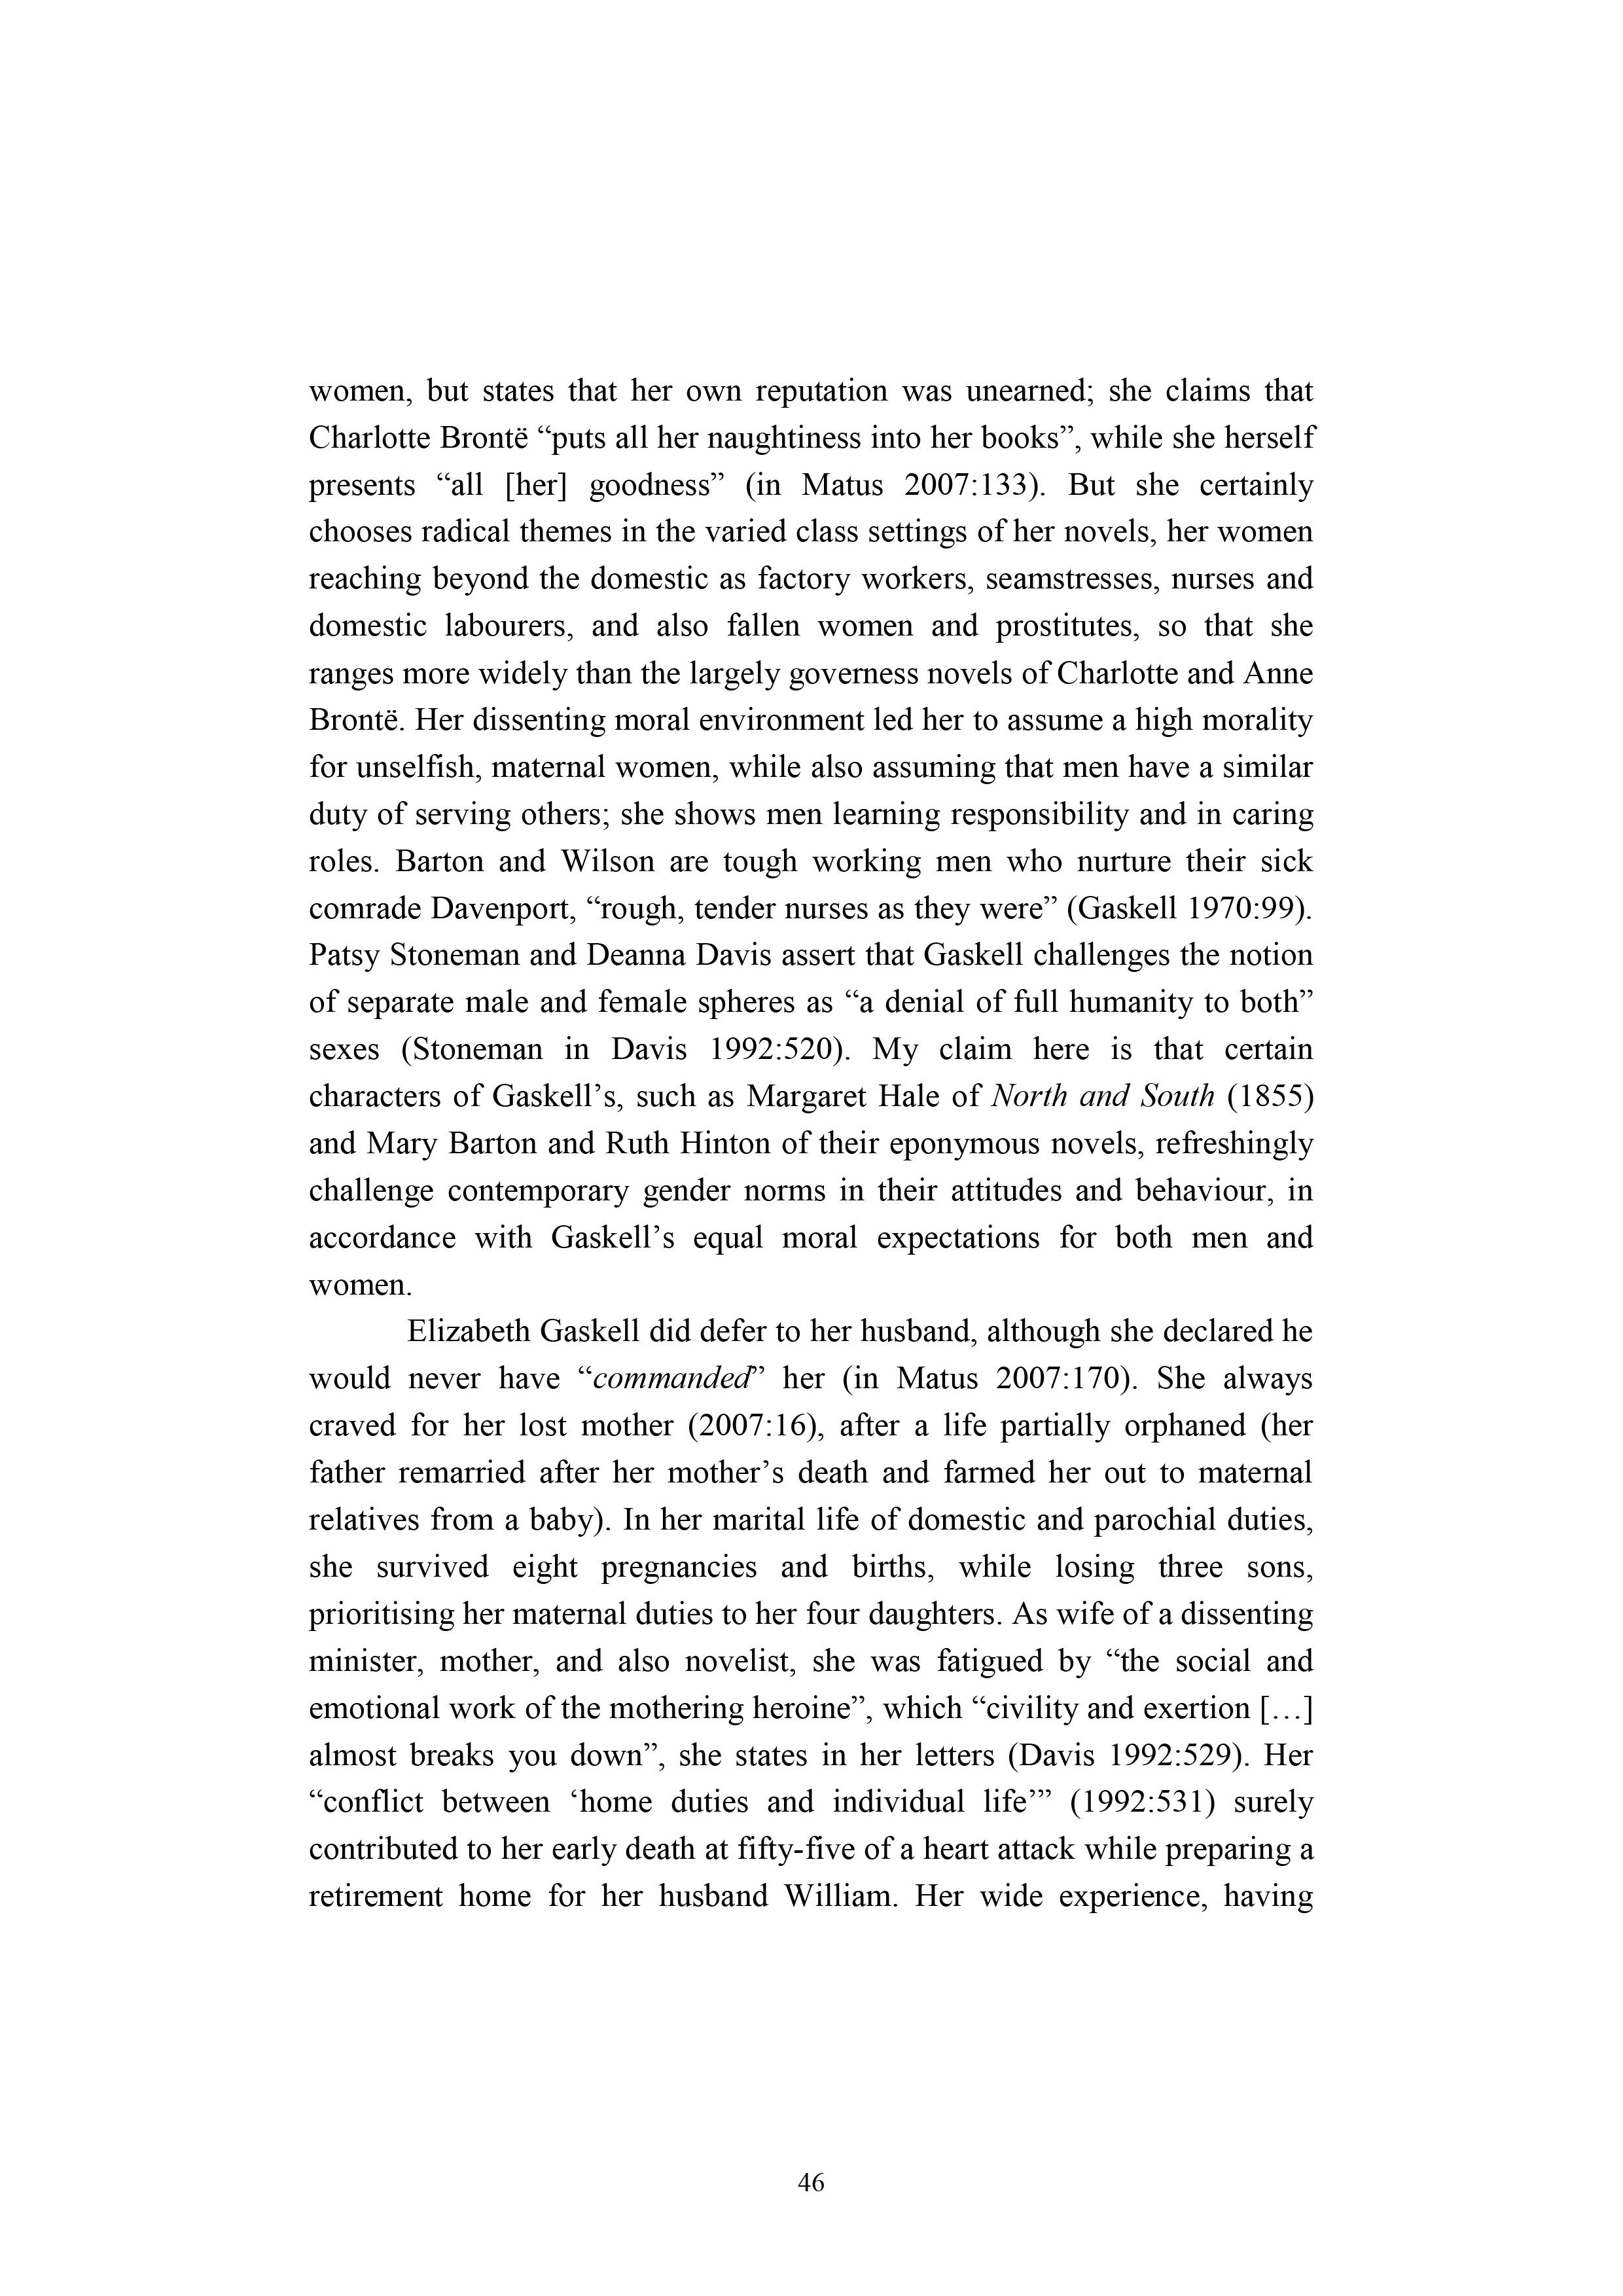 [22860134 - Gender Studies] Gars Challenging Gender Norms(1) 2.jpg